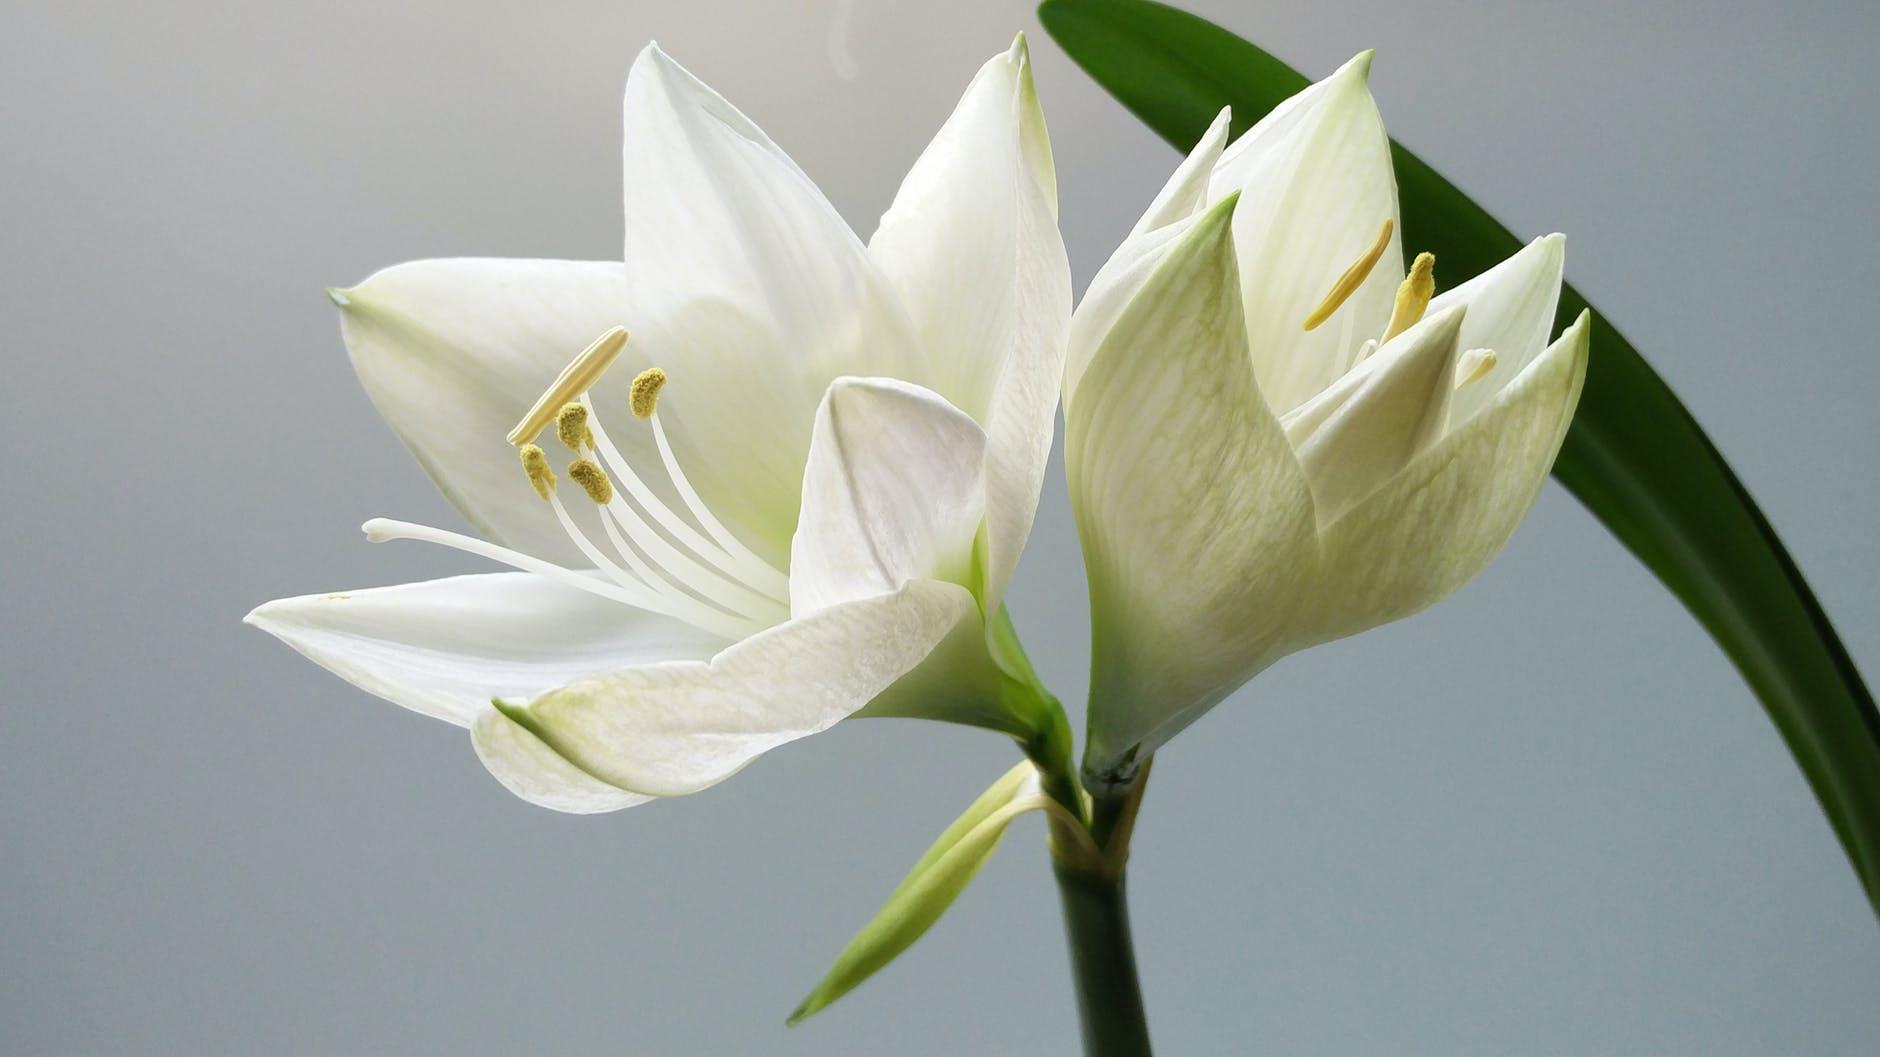 nature plant white flower